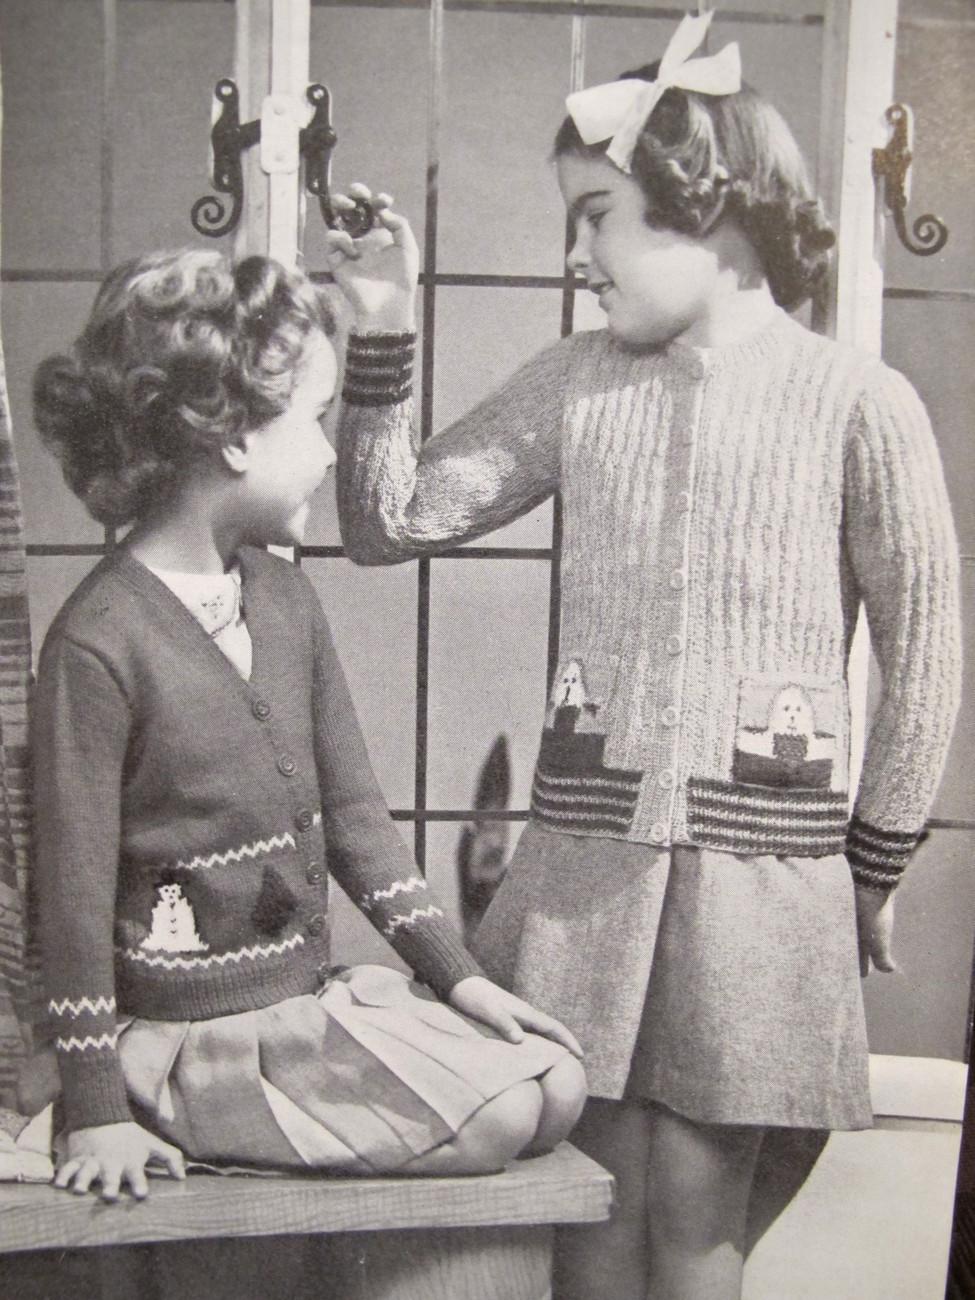 Vintage Knitting Patterns Toyland Cardigan Sweaters Jumpers Boleros CHILDREN